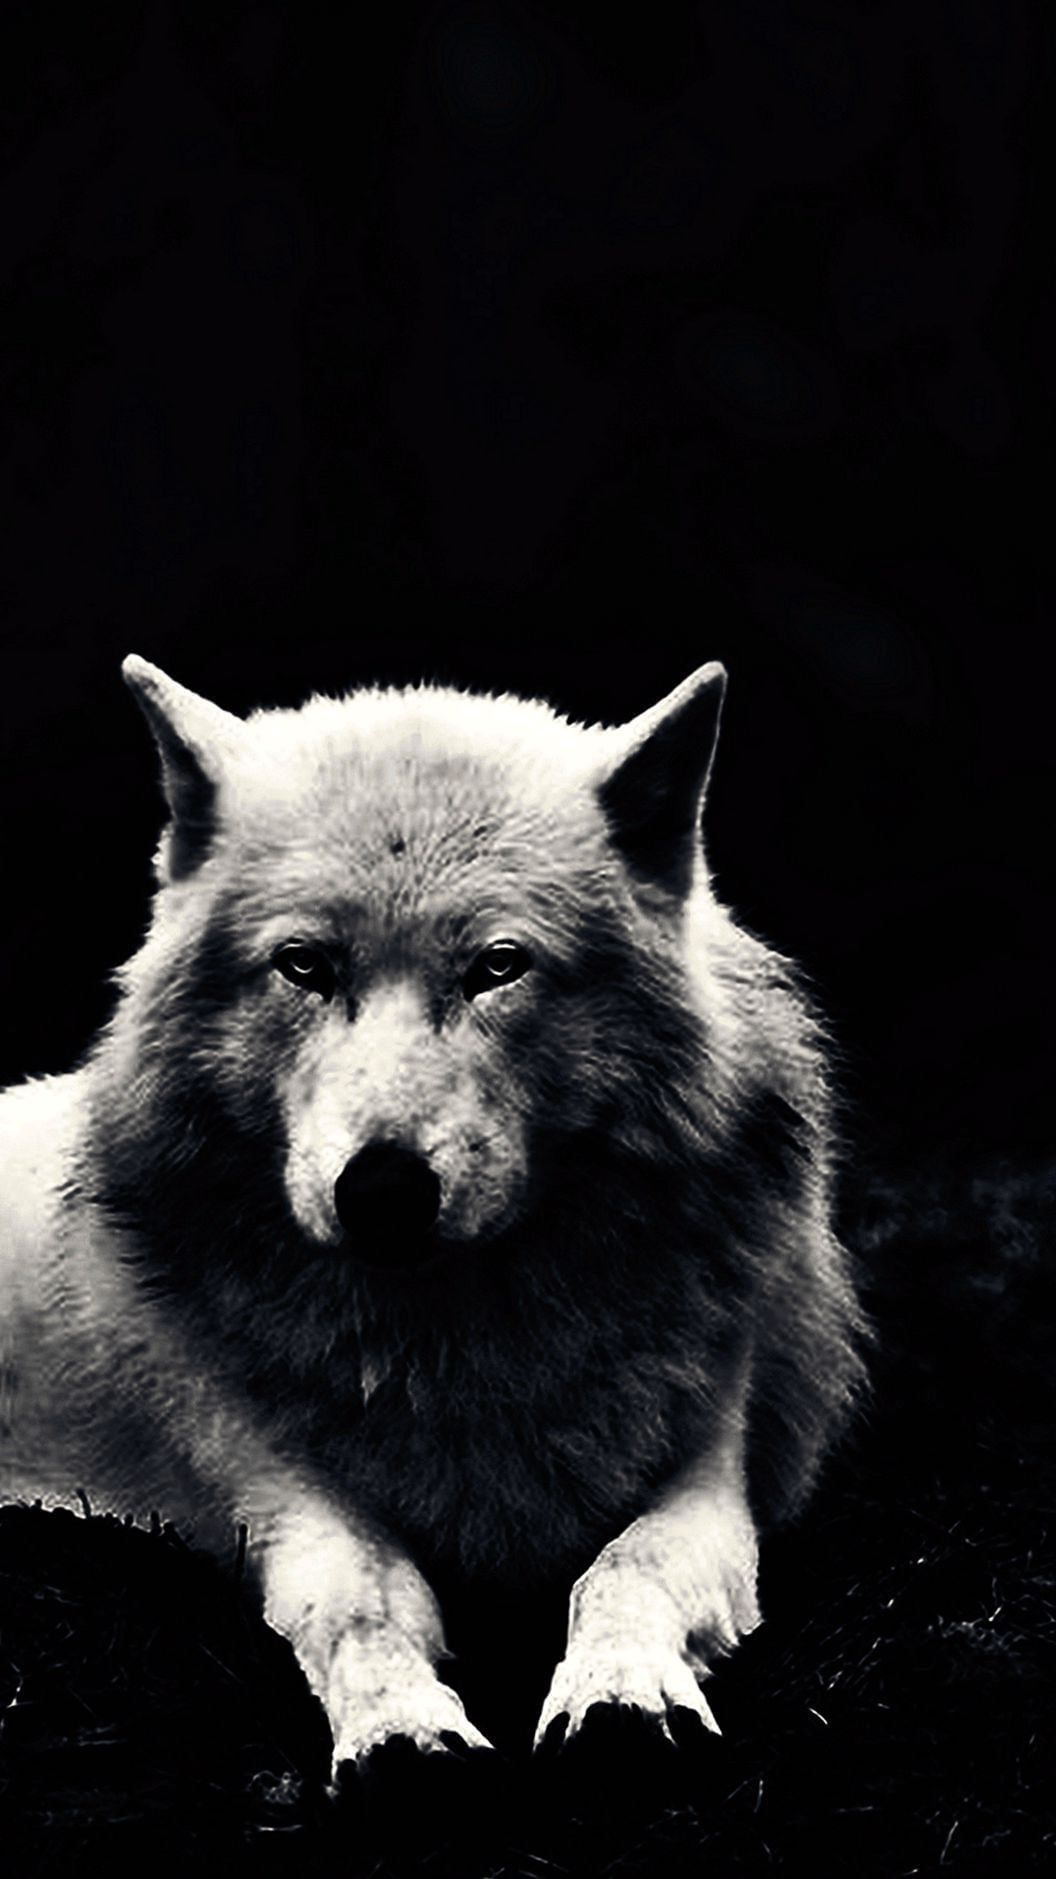 Black Wolf Hd Mobile Wallpaper